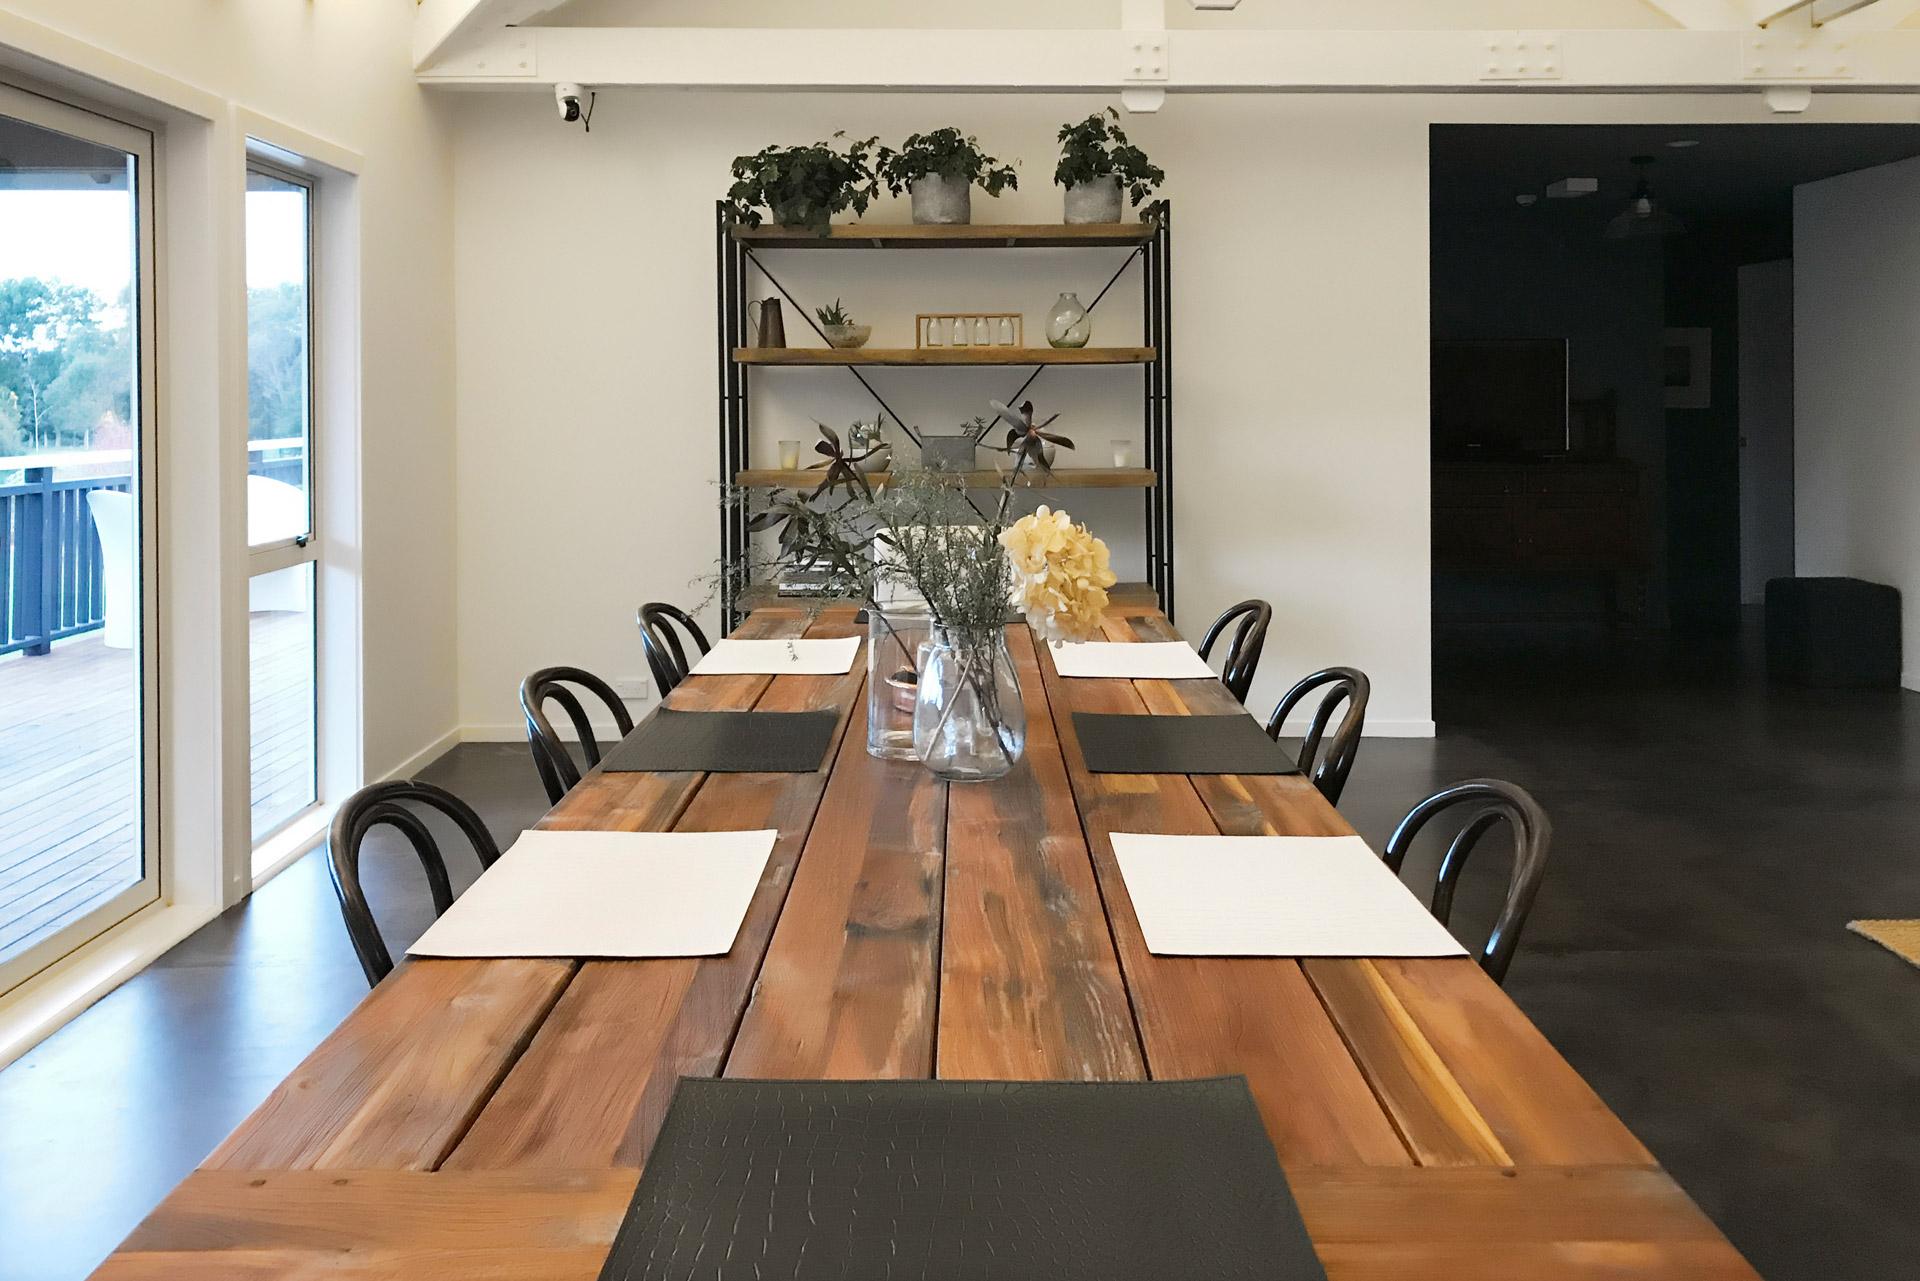 HUS Art Farm Dinning Table